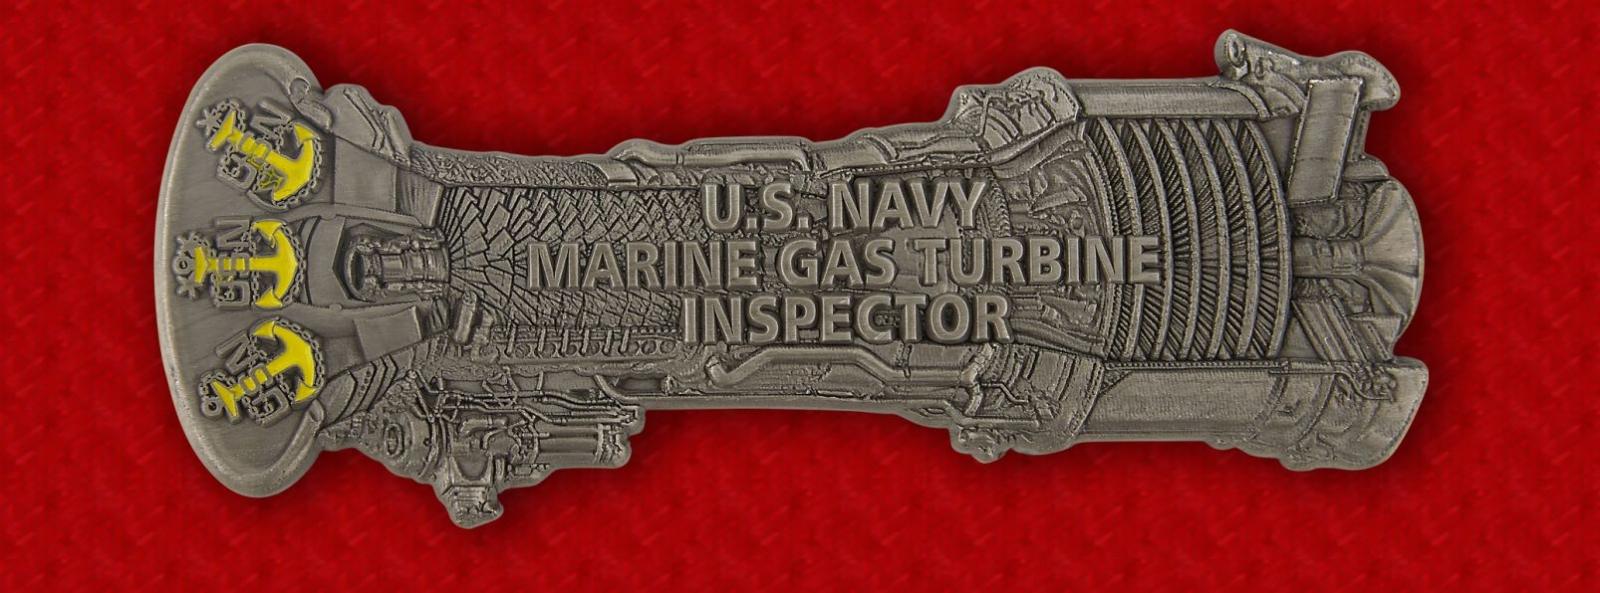 U.S. Navy Marine Gas Turbine Inspector Challenge Coin